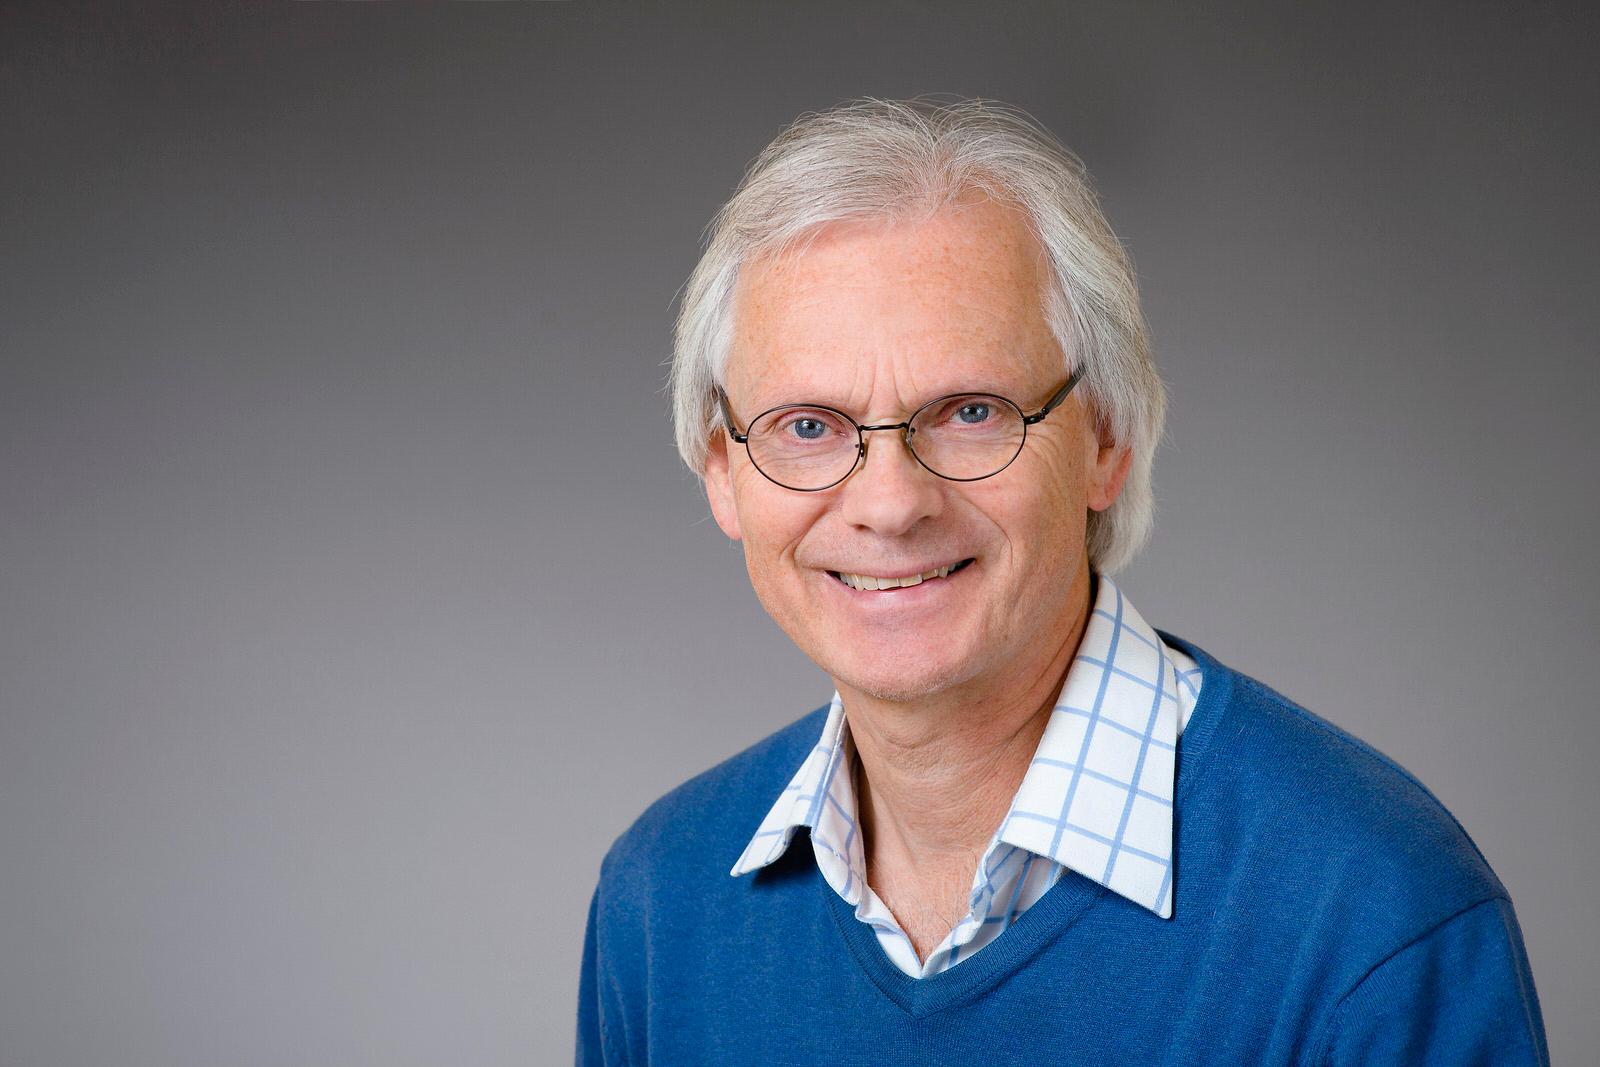 Sven-Arne Silfverdal